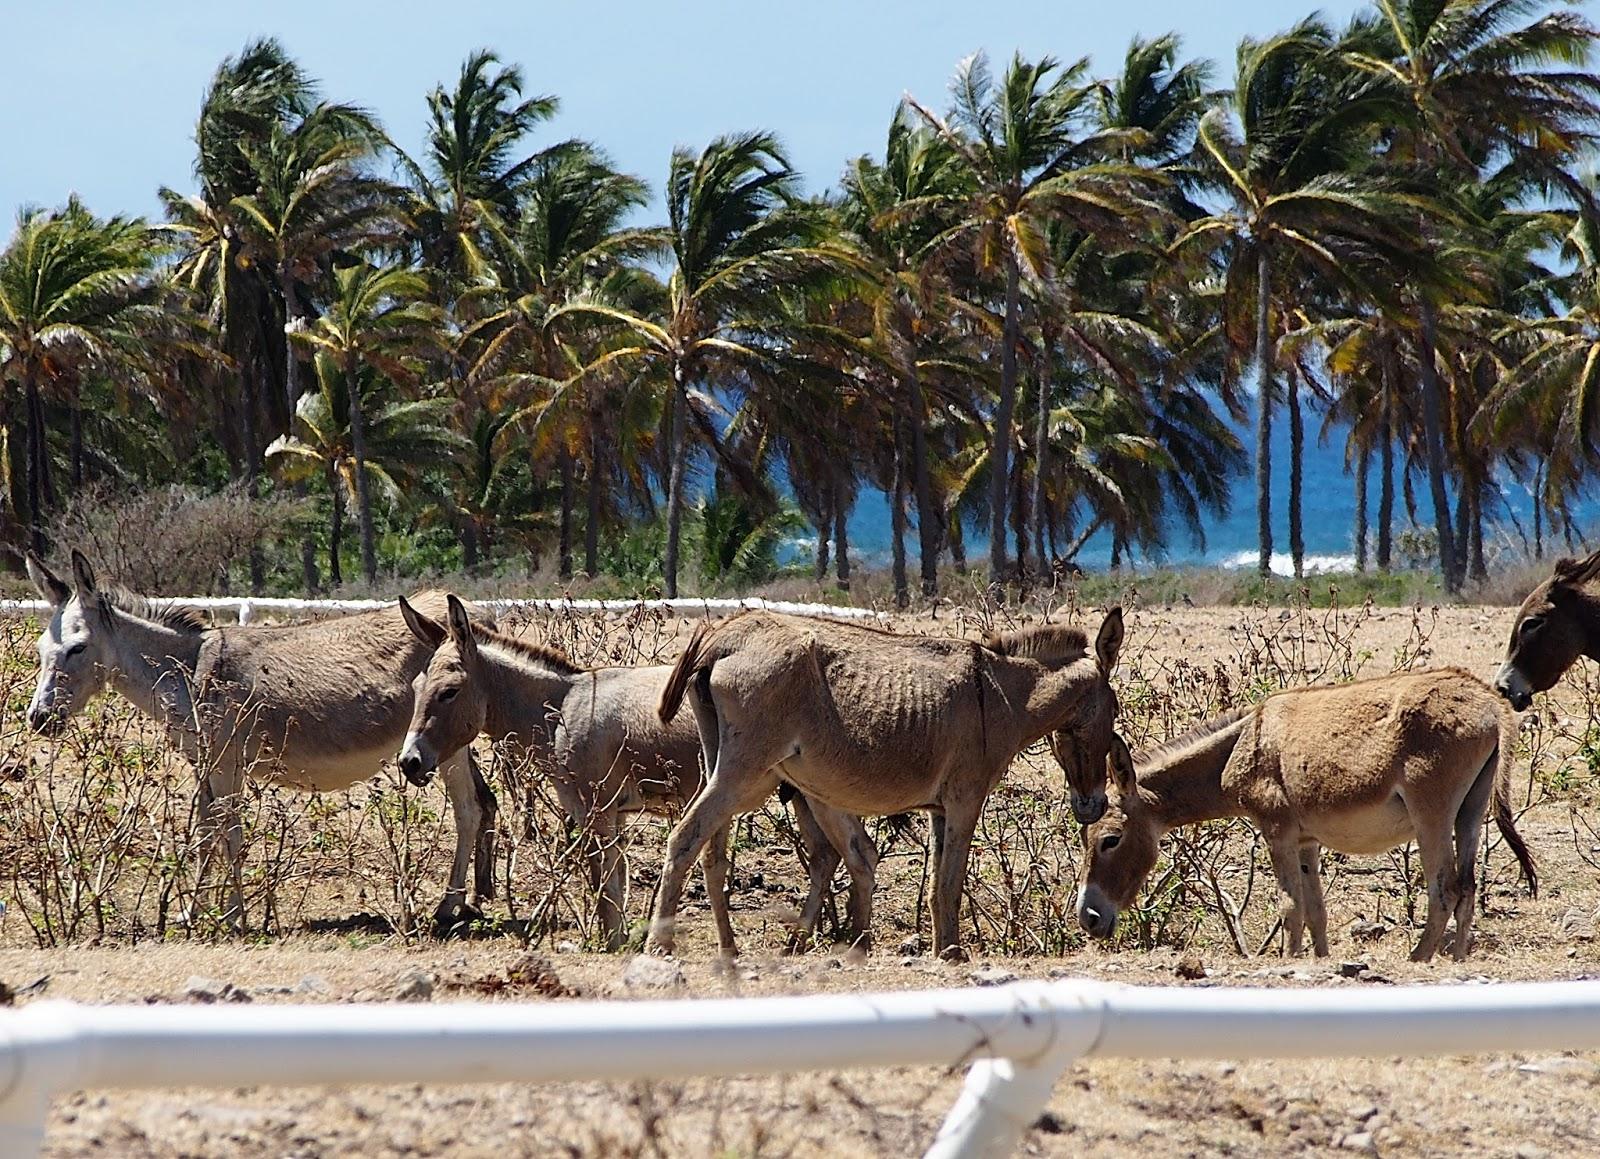 Donkey Donkey Racing #IndianCastleRacetrack #racetrack #donkey #donkeys #caribbean #Nevis ©2015 Nancy Lundebjerg